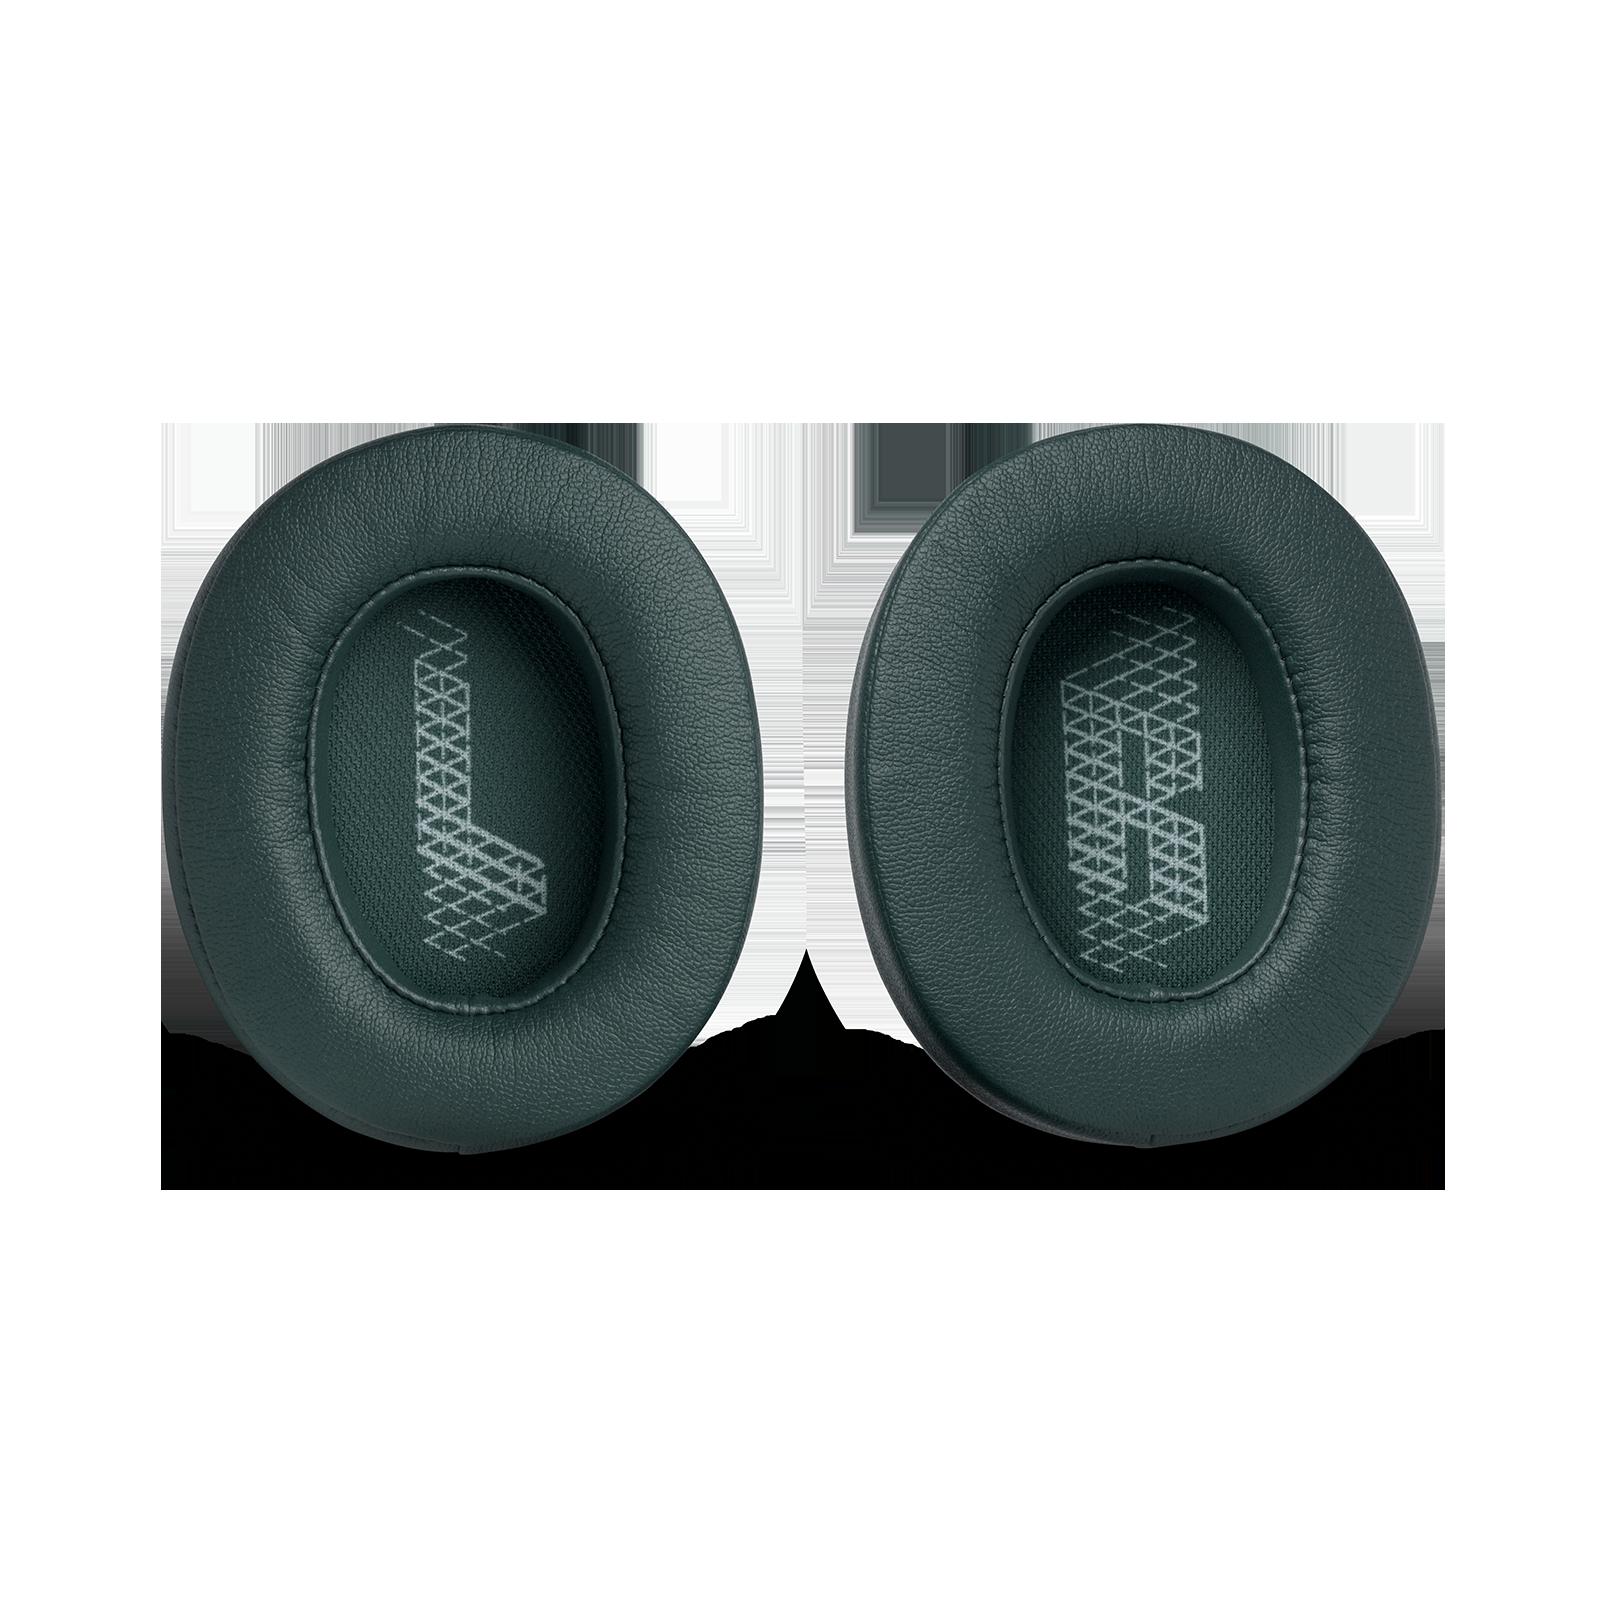 JBL Ear pads for Live 500